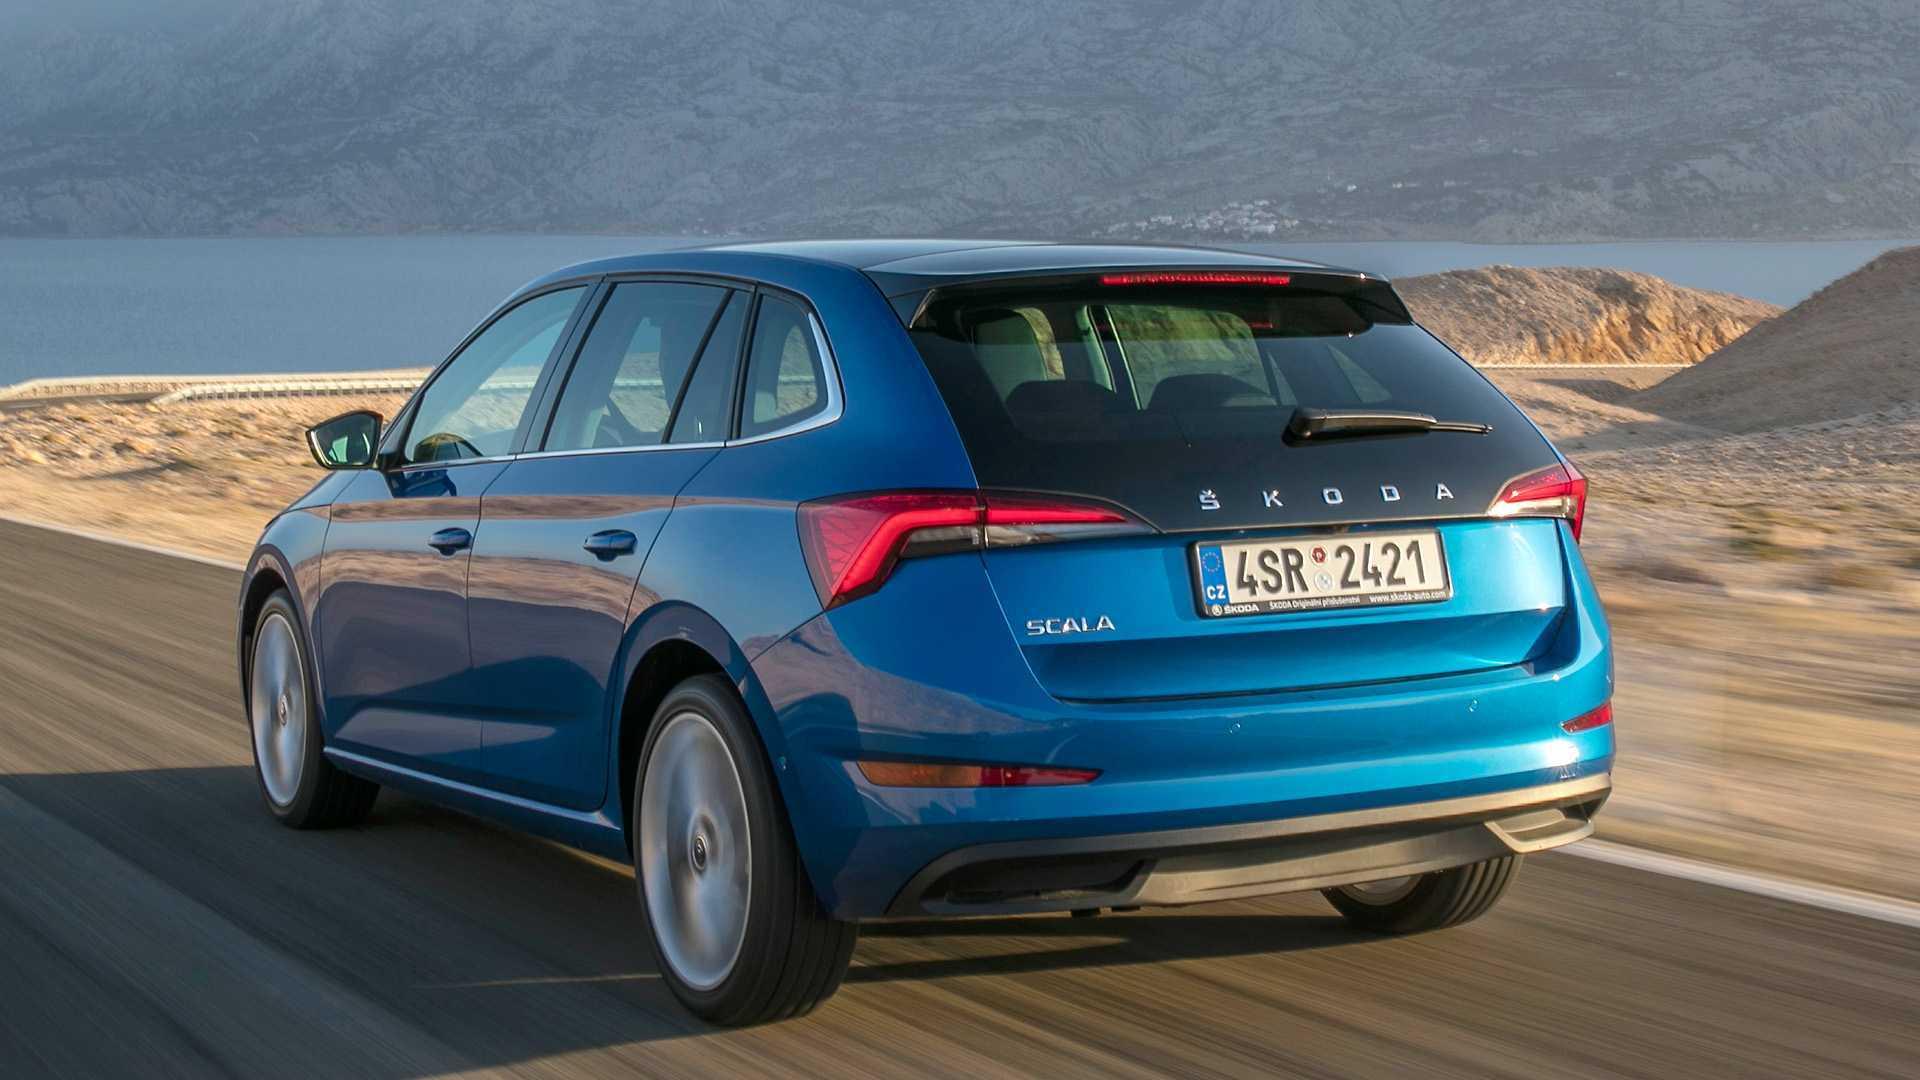 Audi, volkswagen, seat и skoda на одной платформе